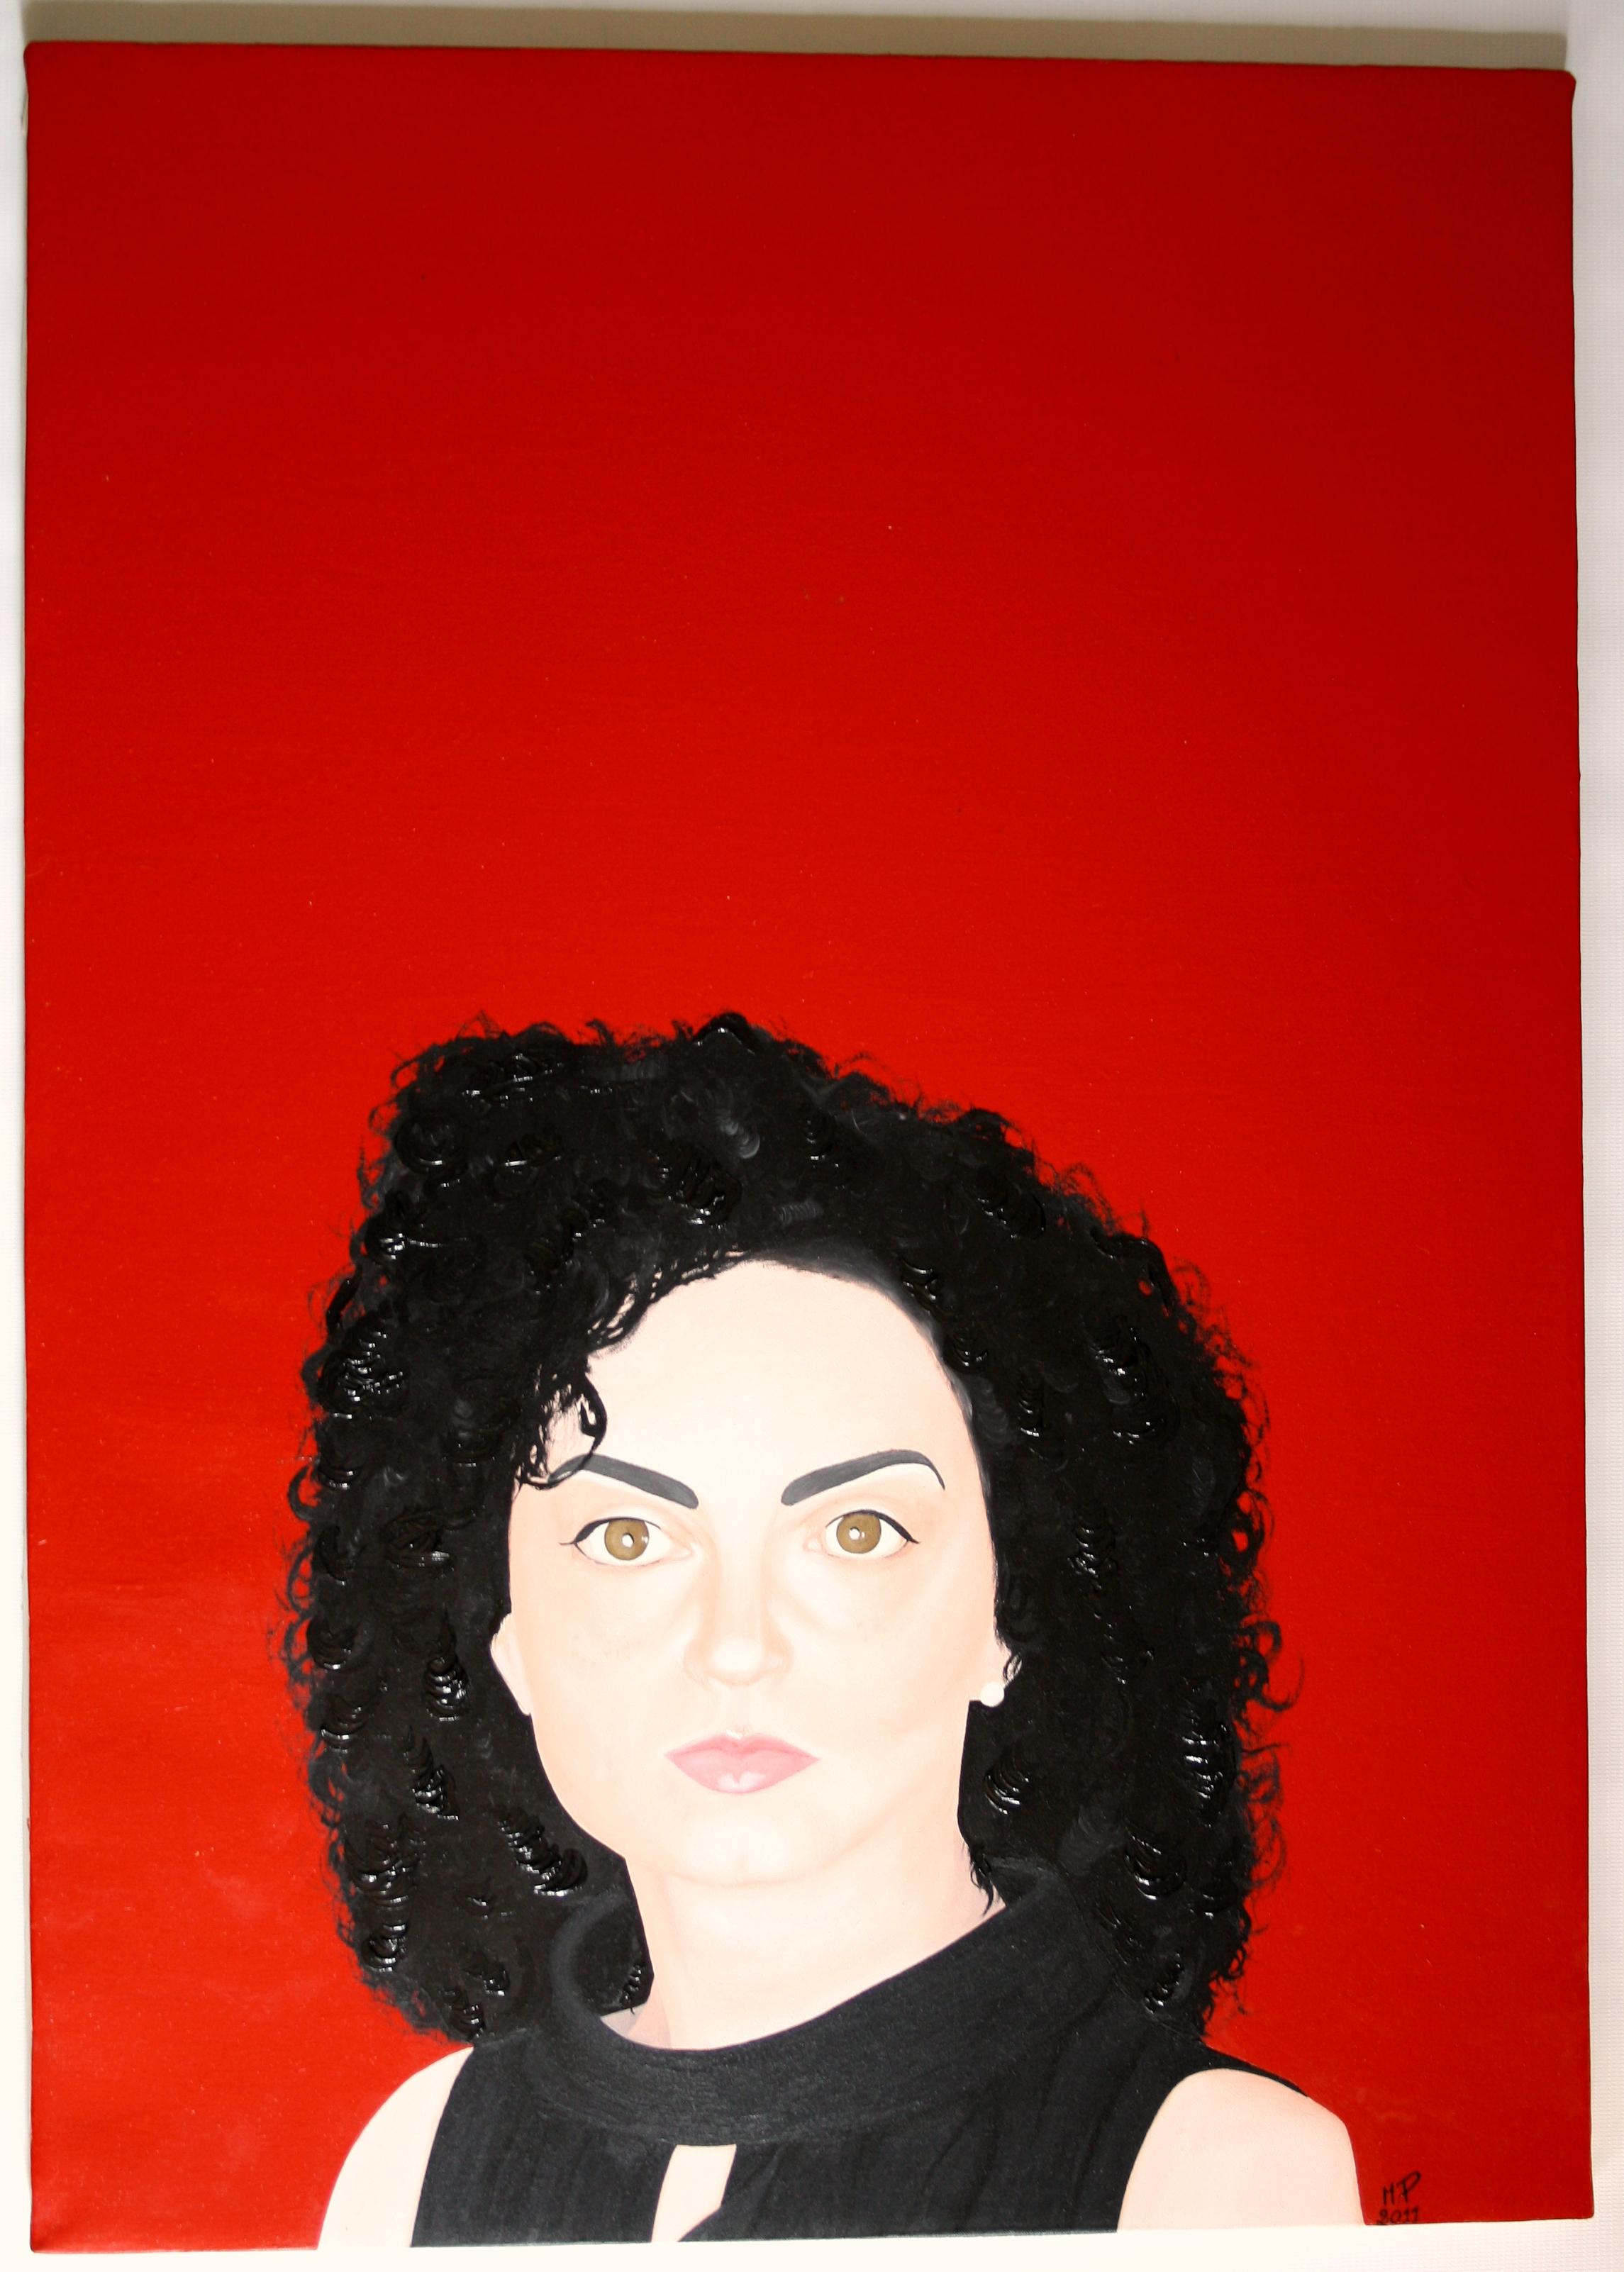 Ritratto femminile, 2011 olio su tela cm 50x70, Pasquale Mastrogiacomo